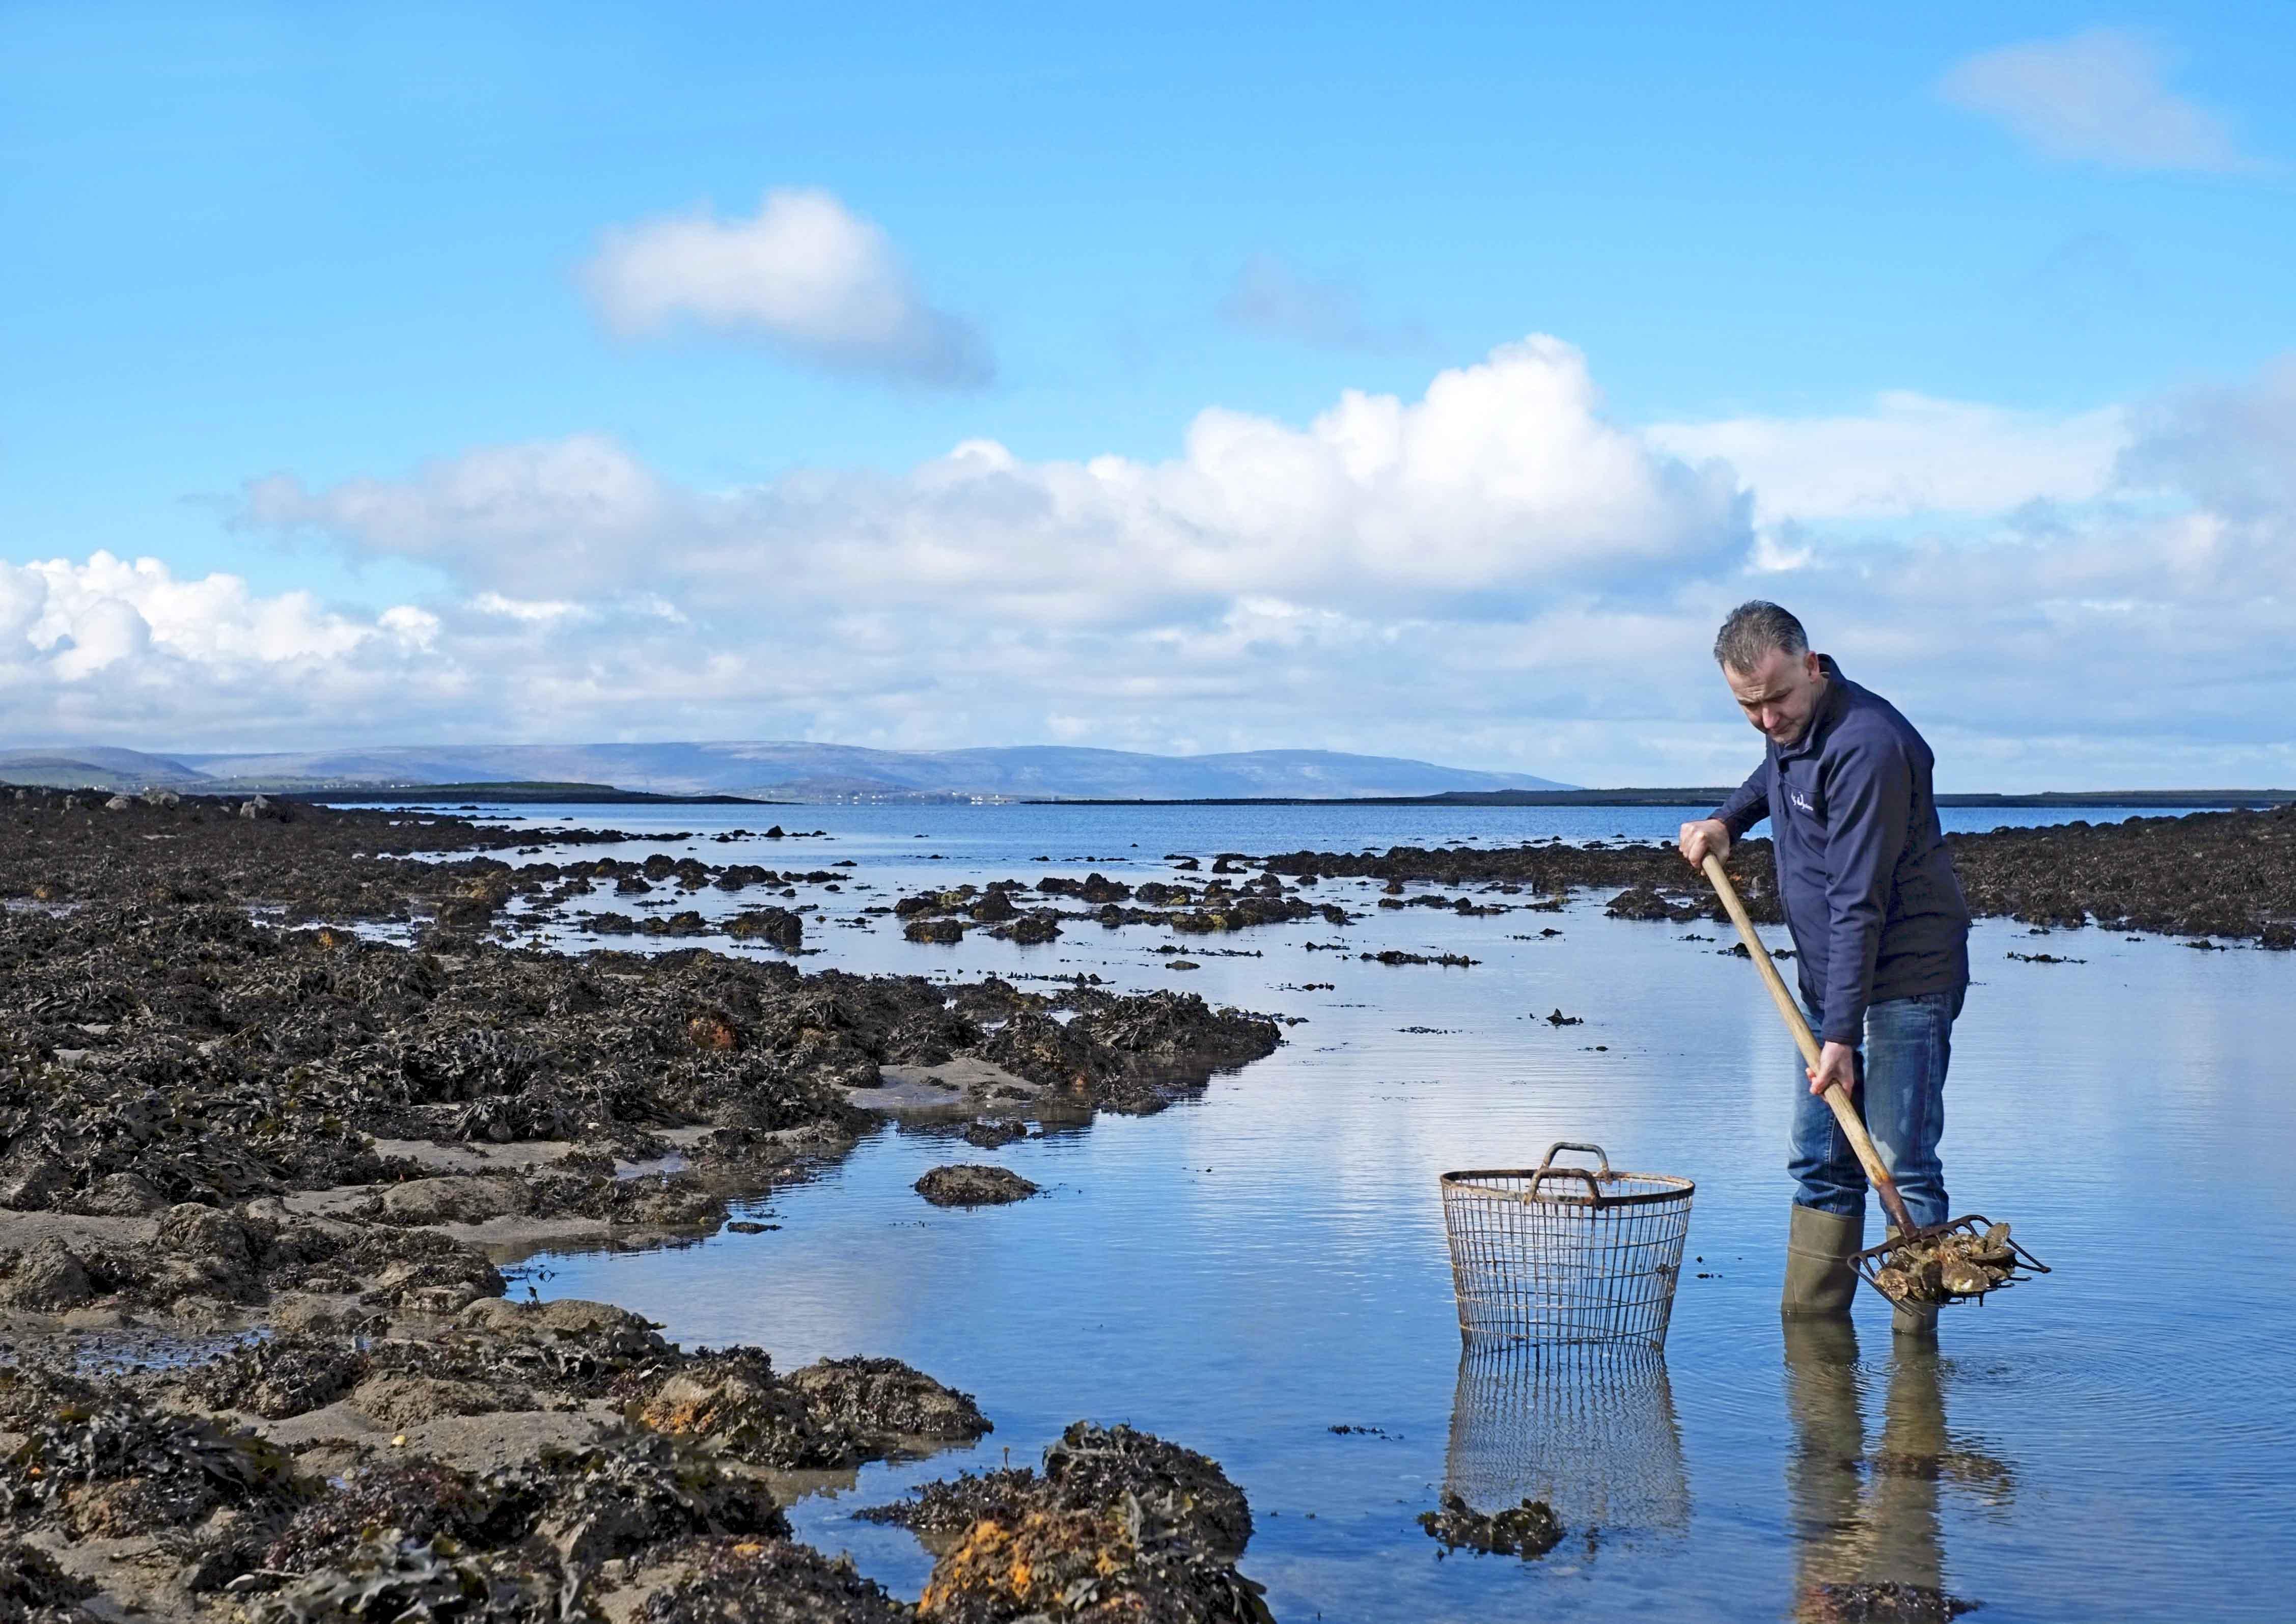 Diarmuid Kelly harvesting native oysters in Clarinbridge